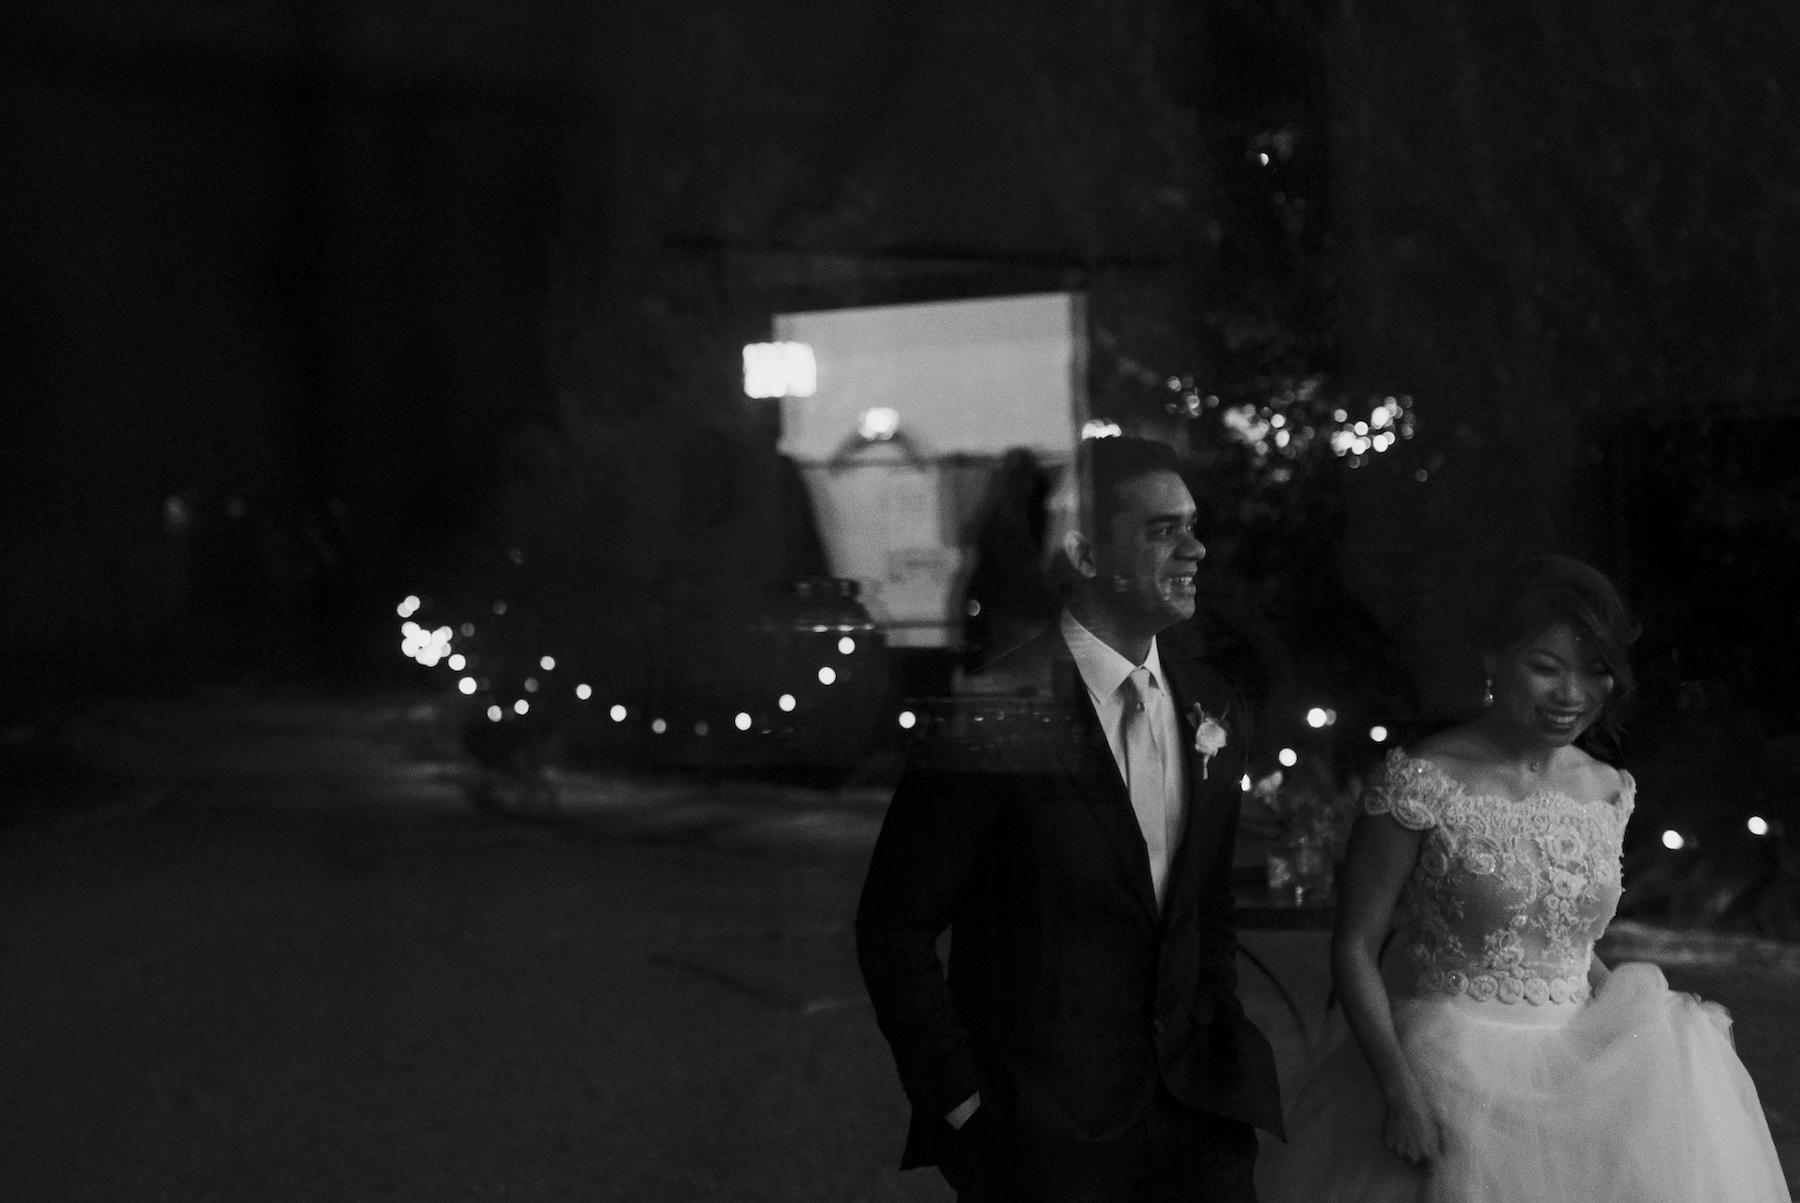 barr-mansion-wedding-austin-texas8892.JPG